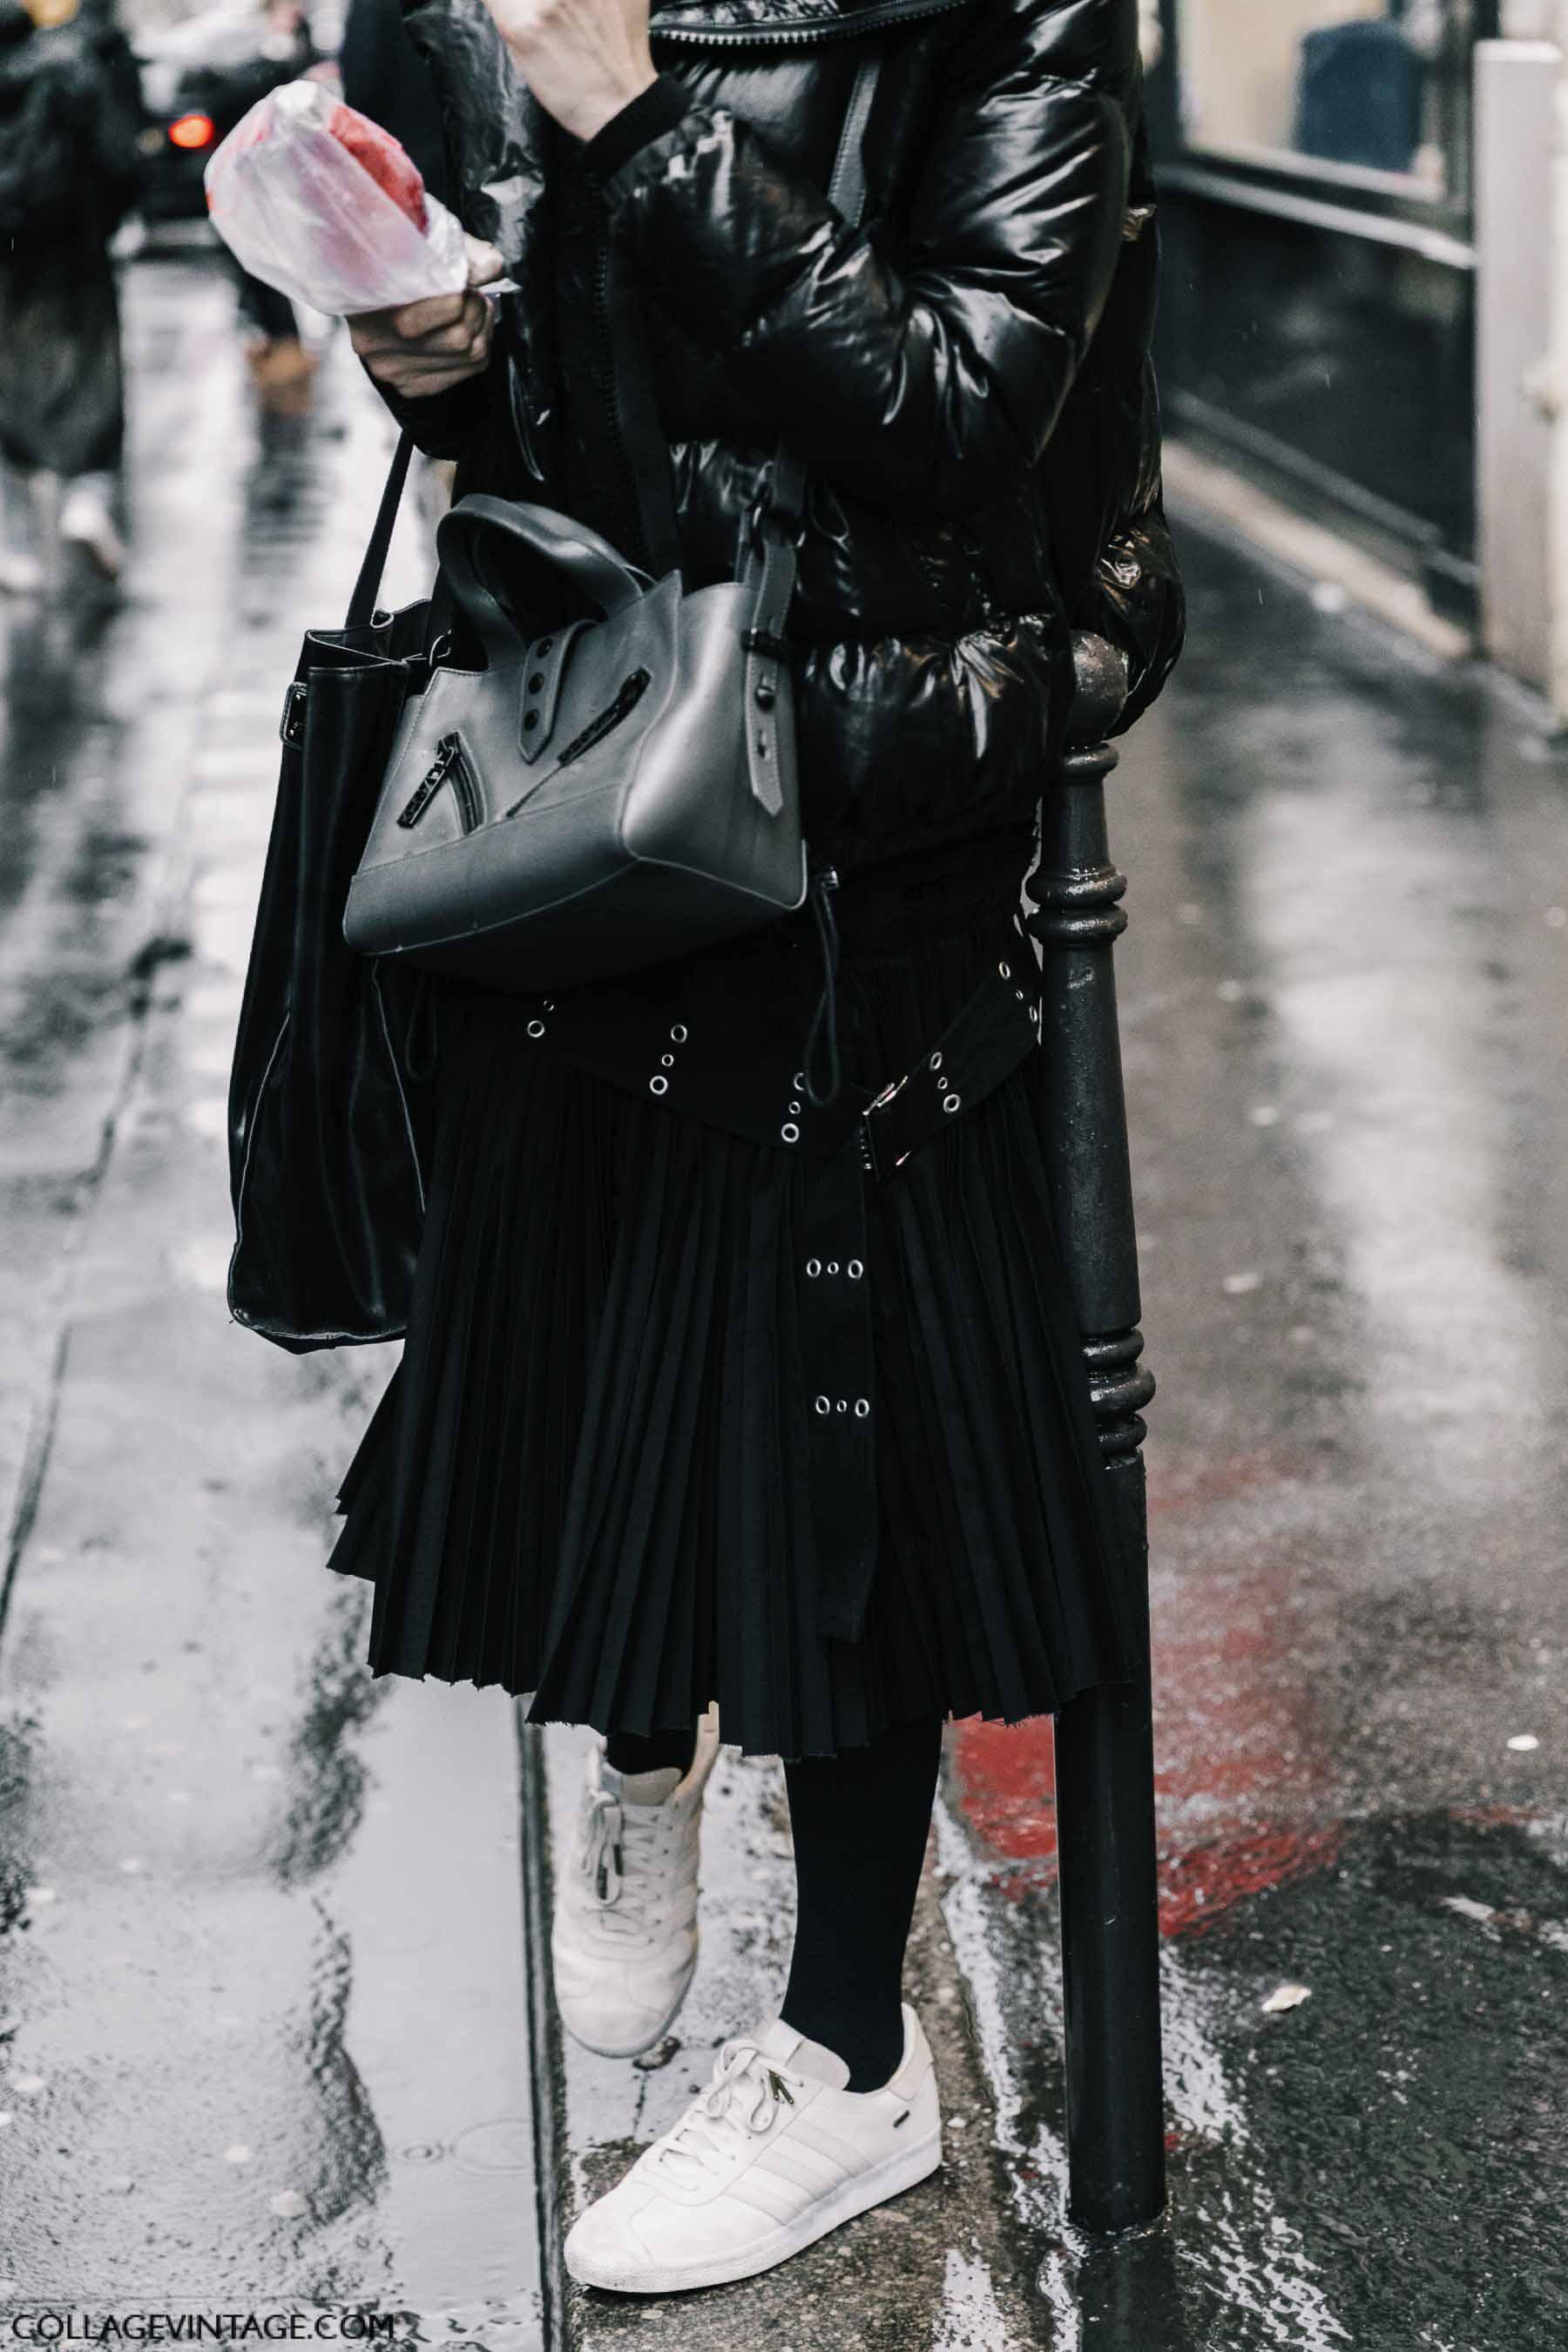 пуховик, парижский гардероб, parisian chic, parisian street style